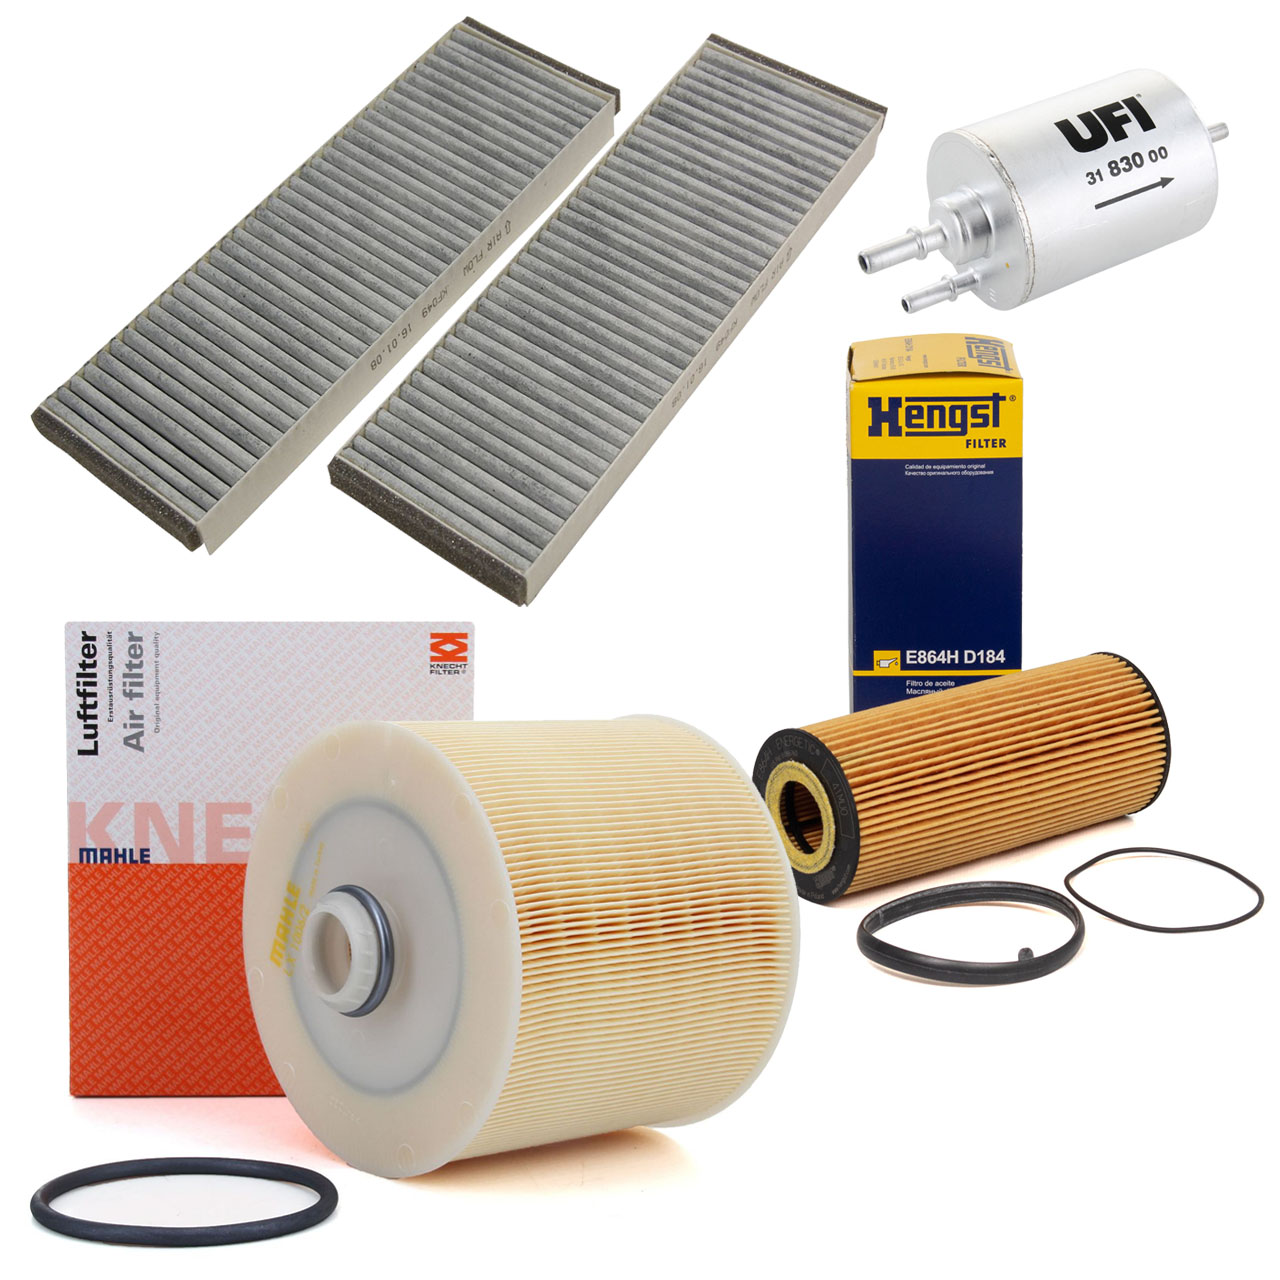 Inspektionskit Filterpaket Filterset für AUDI A6 4F C6 2.4 / 2.4 quattro 177 PS